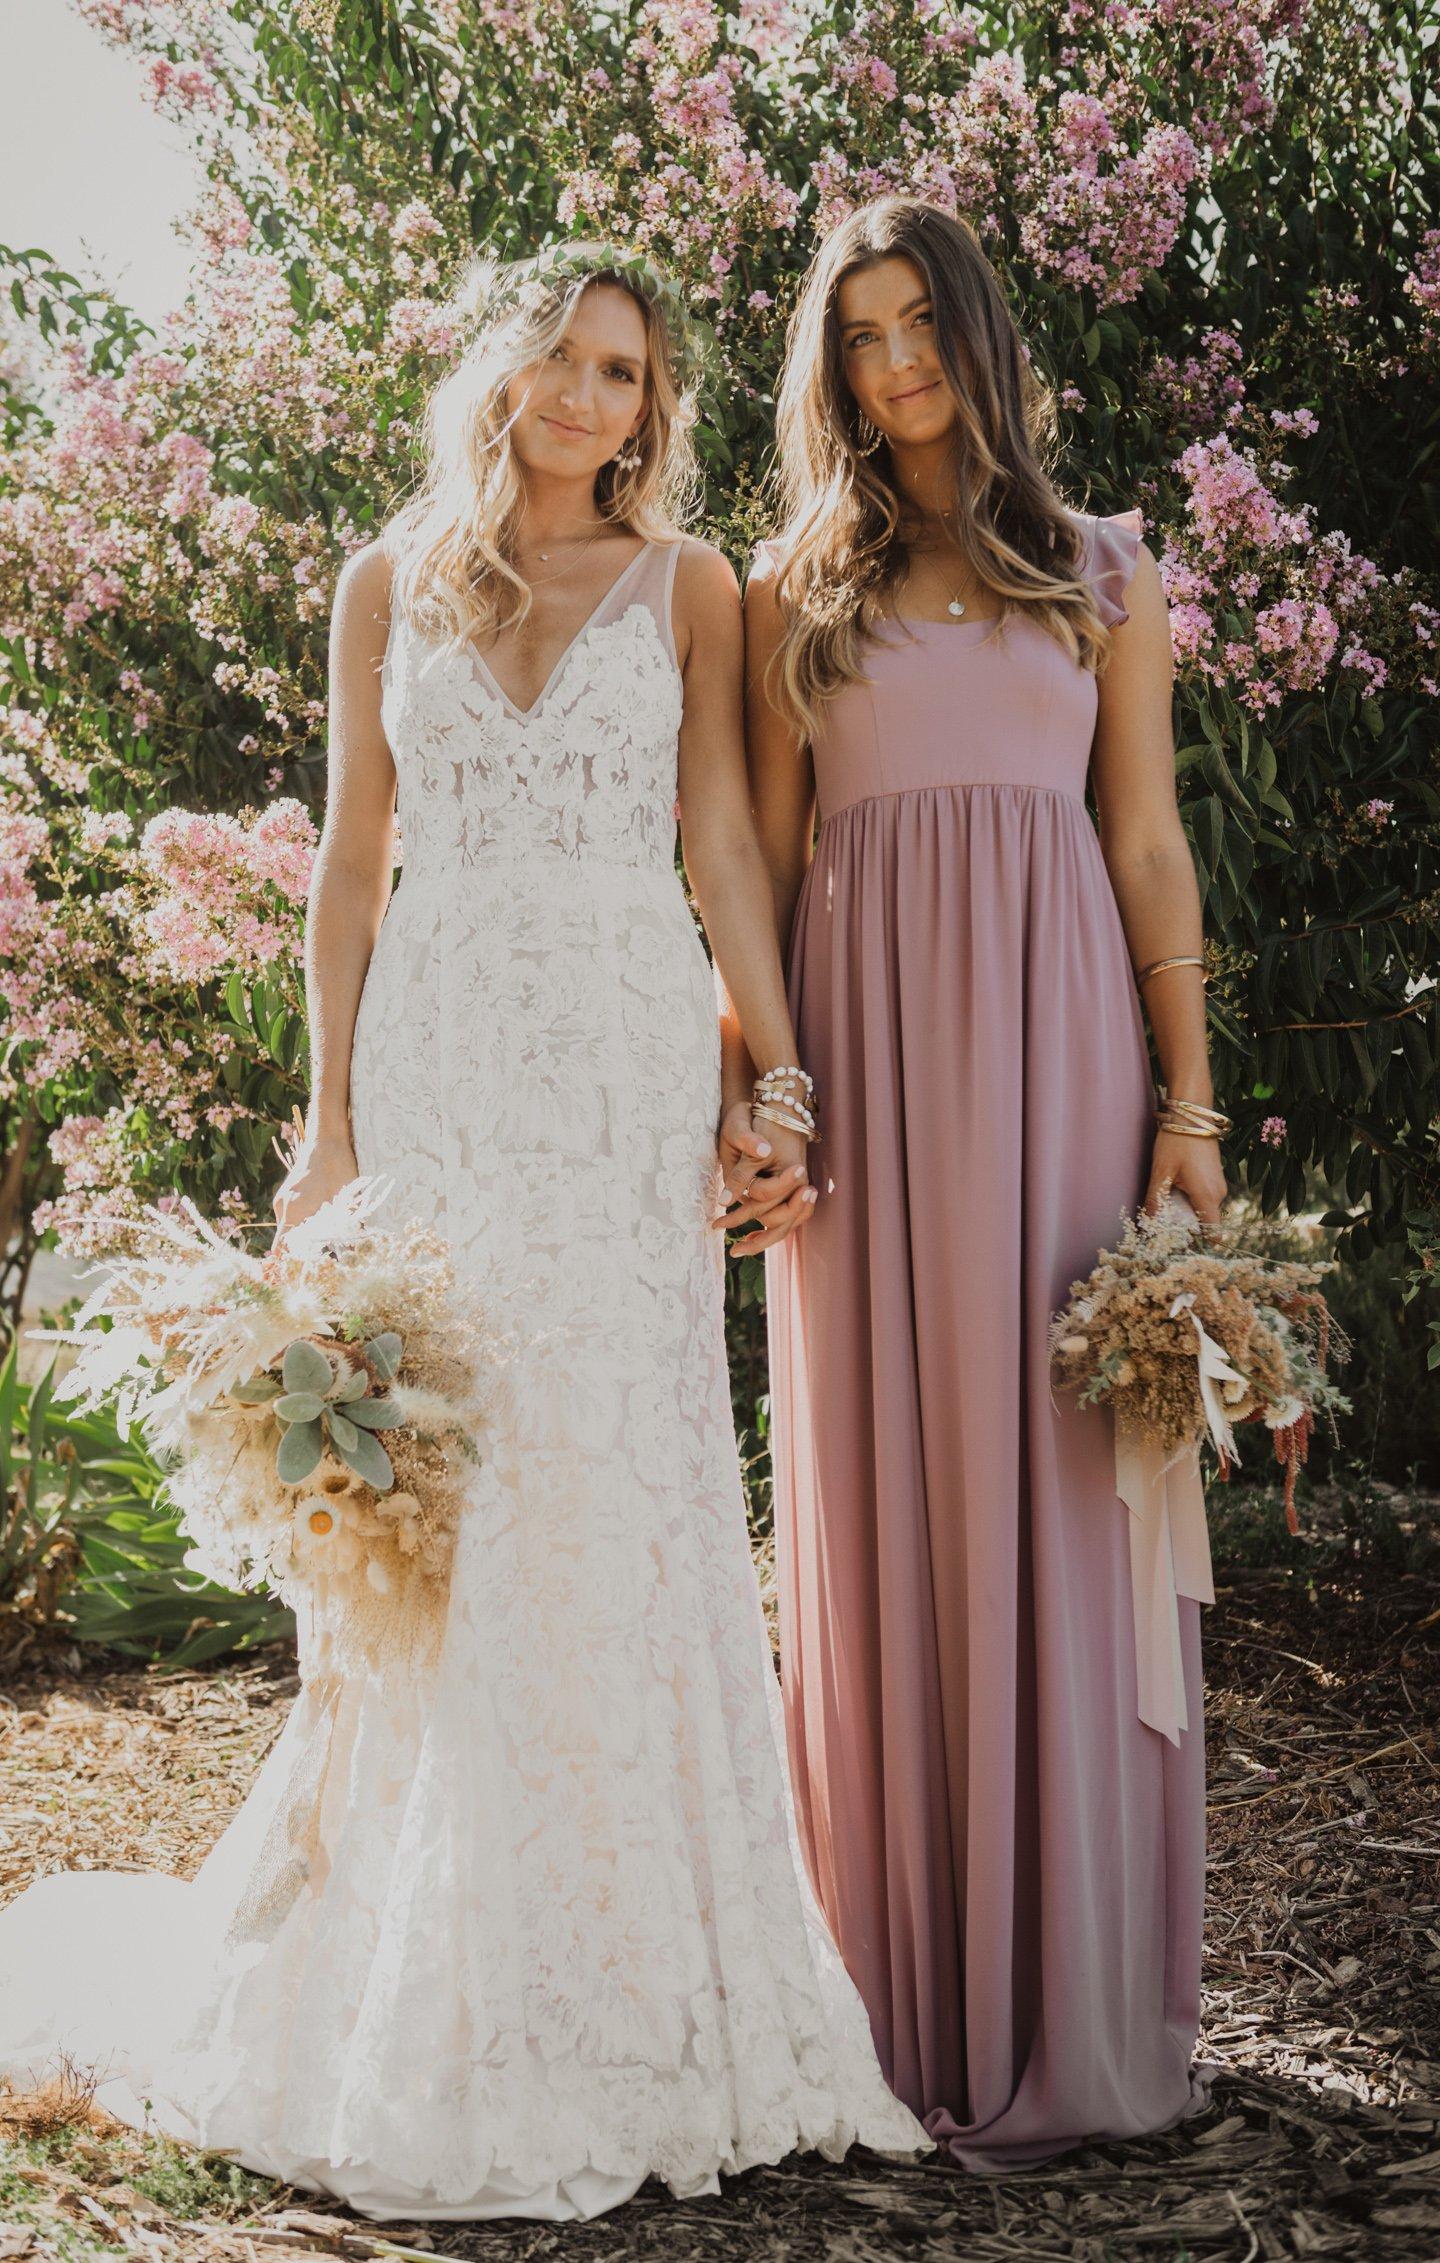 bridesmaid dresses, bridesmaid dress ideas, bridesmaid dress colors, bridesmaid dress styles, mauve bridesmaid dress, maxi bridesmaid dress